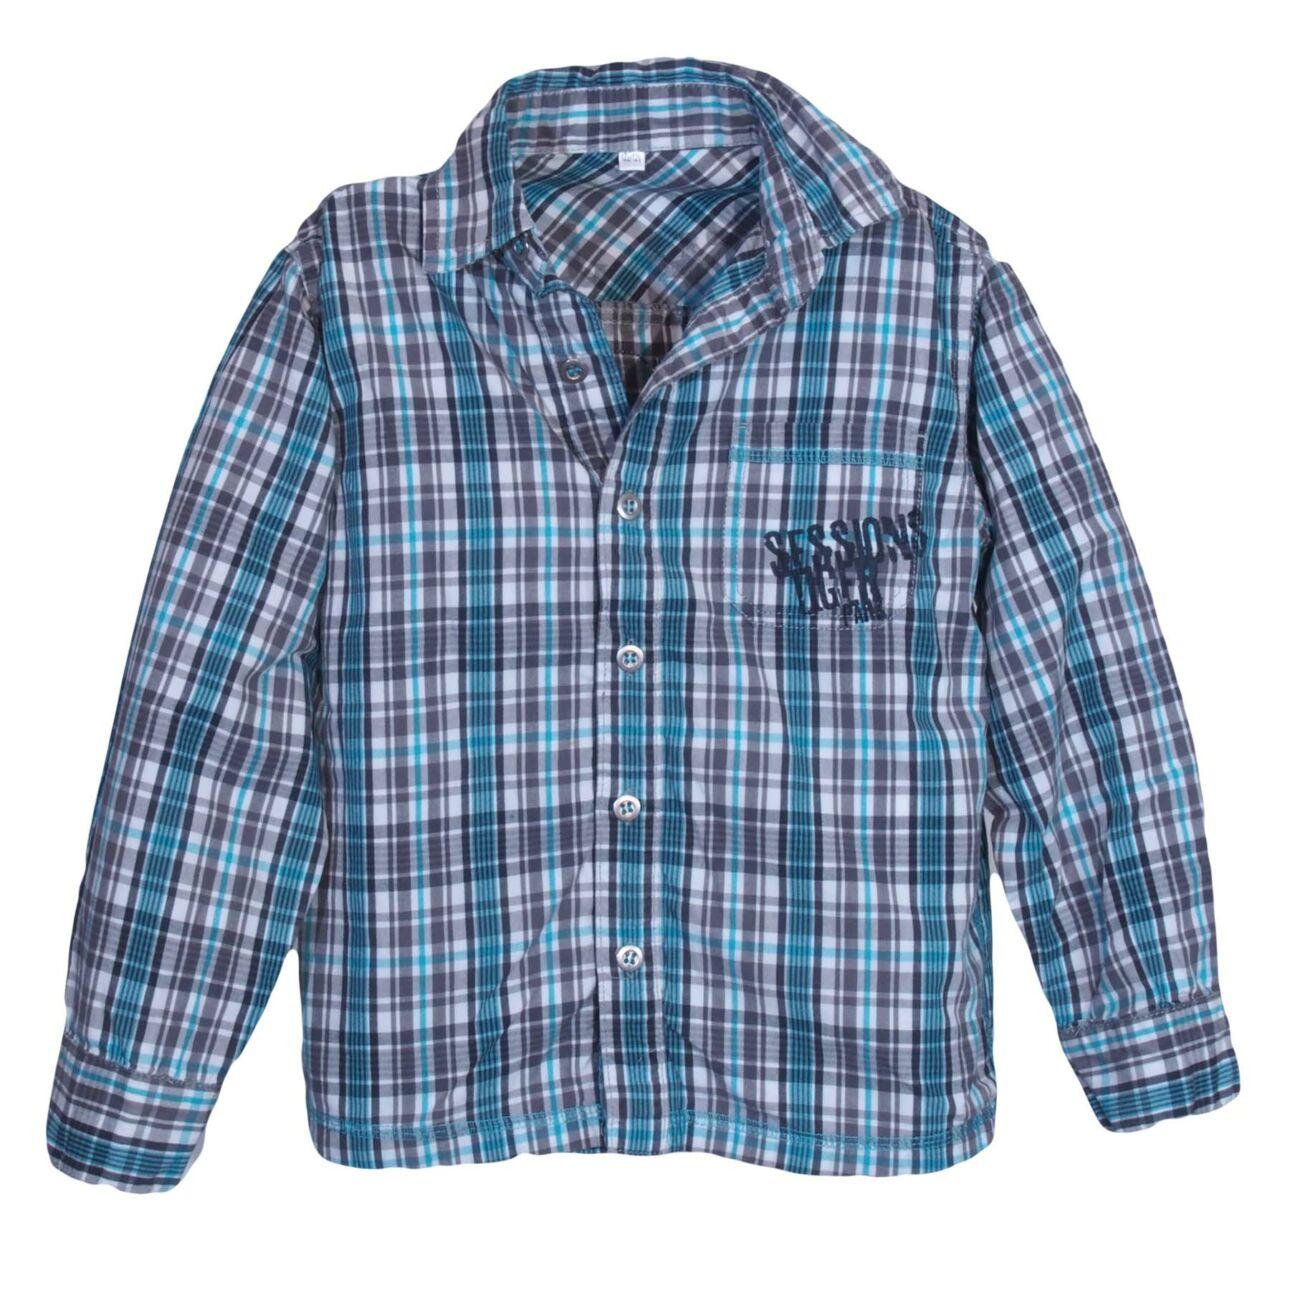 Kék kockás ing (7-8 év)